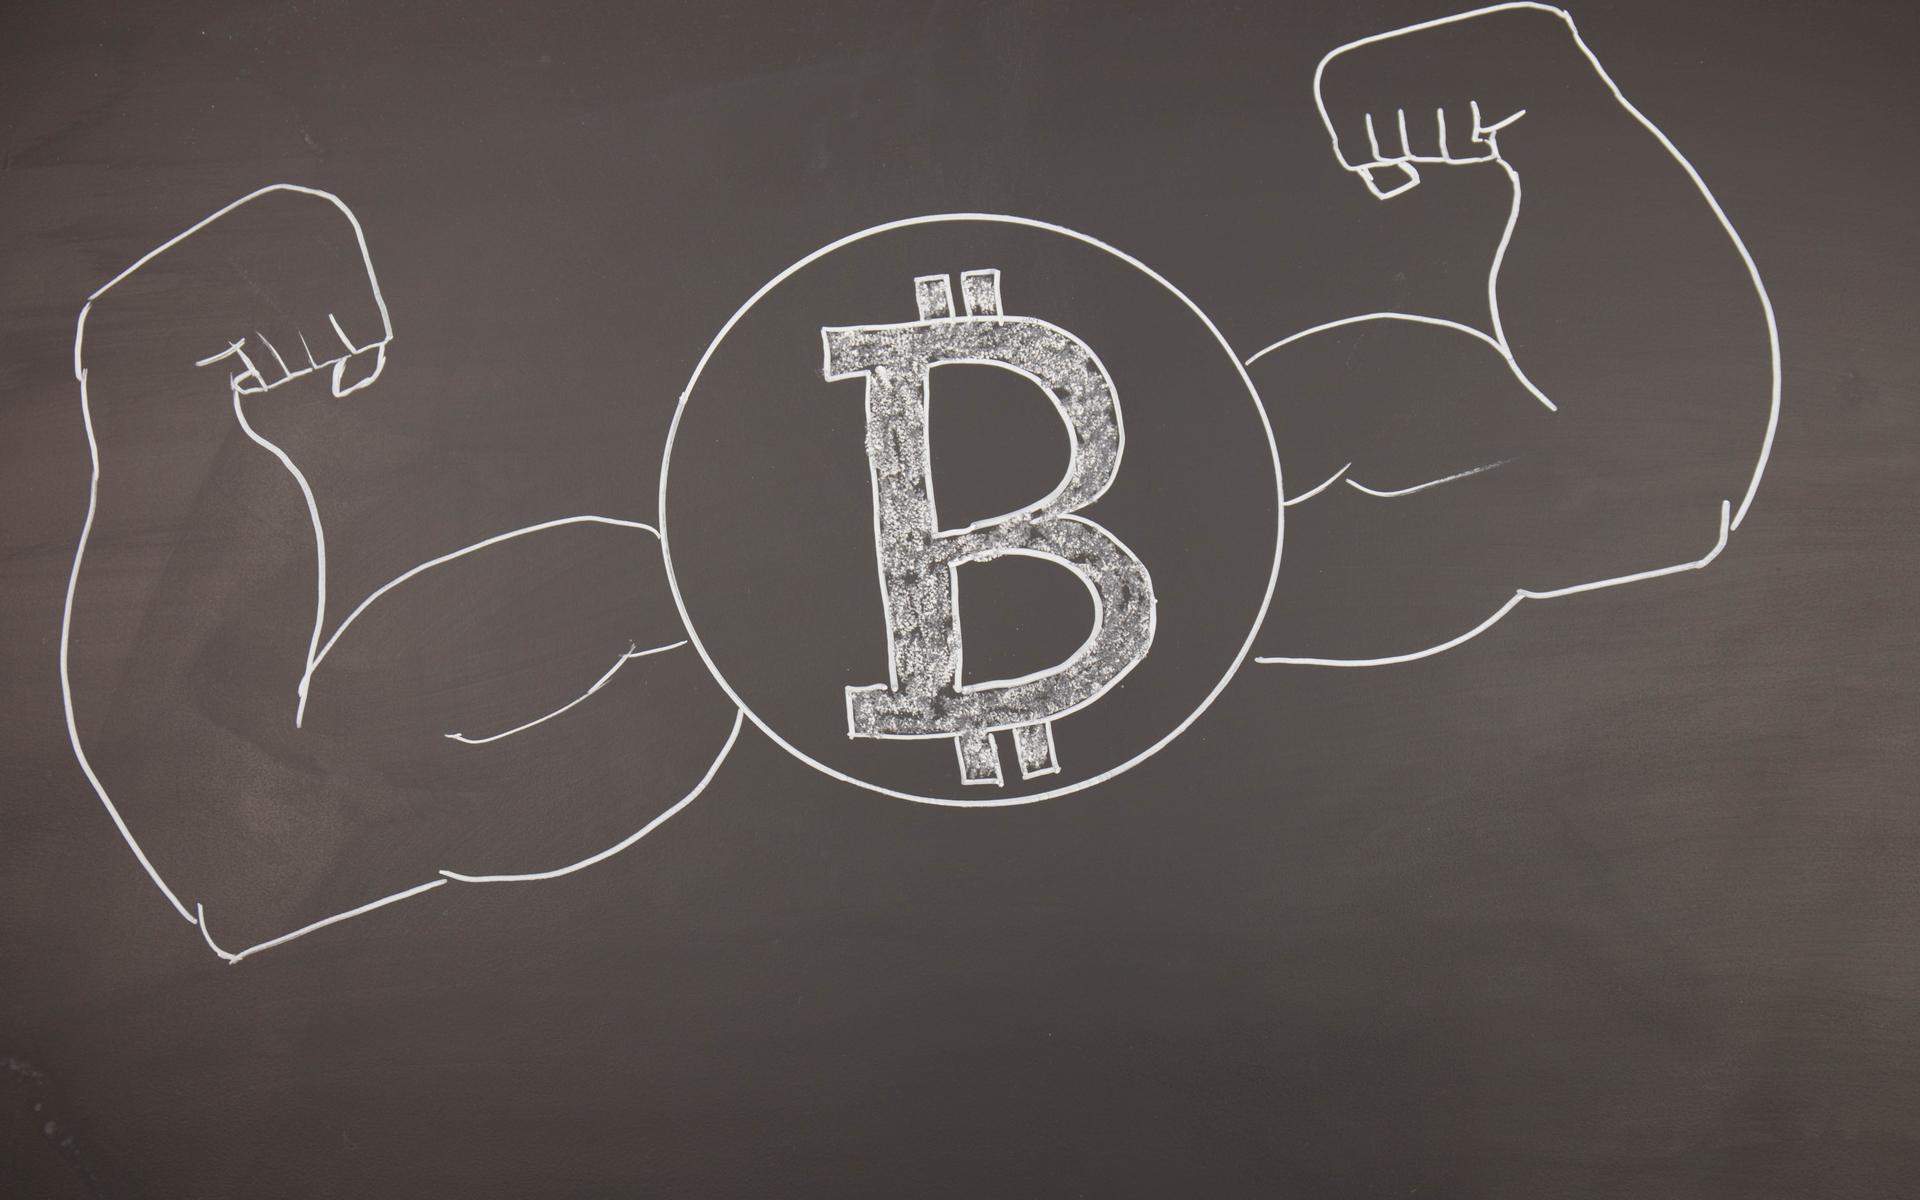 bitcoin fundamentals strong